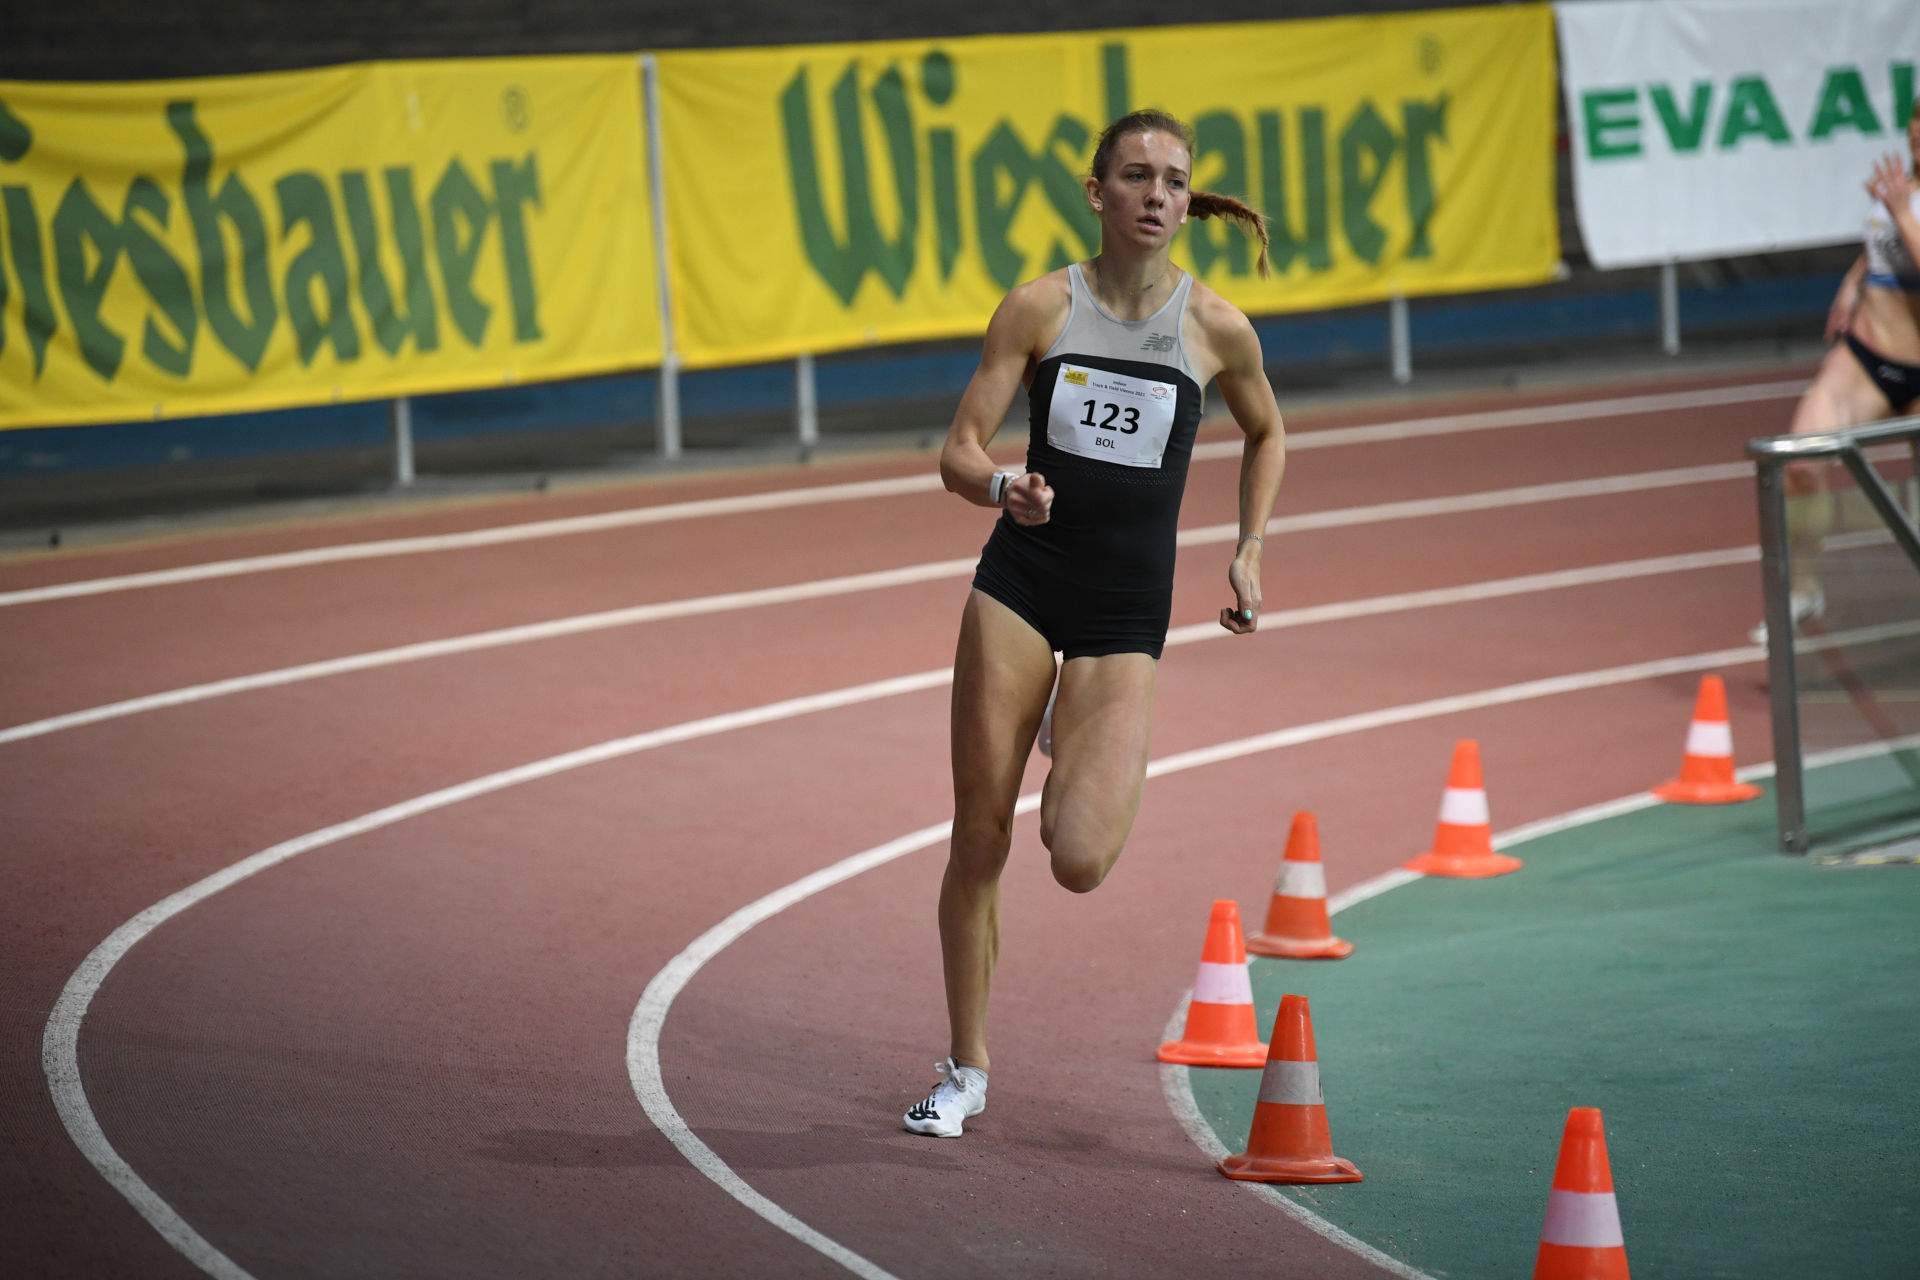 Femke Bol 400m World Lead at the ITFV 2021 (c) Alfred Nevsimal